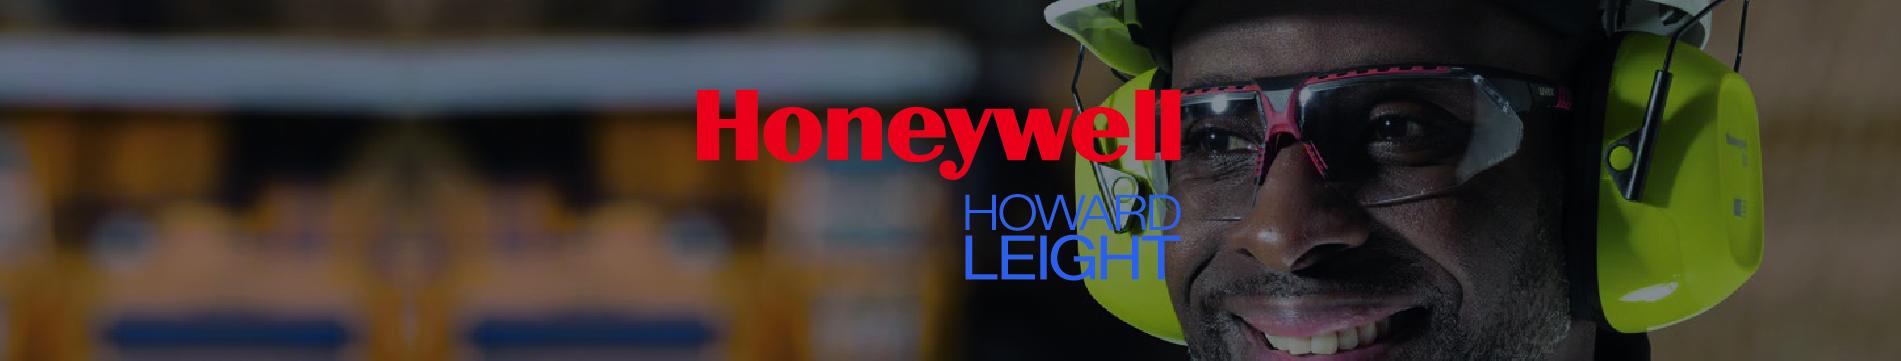 Honeywell howard